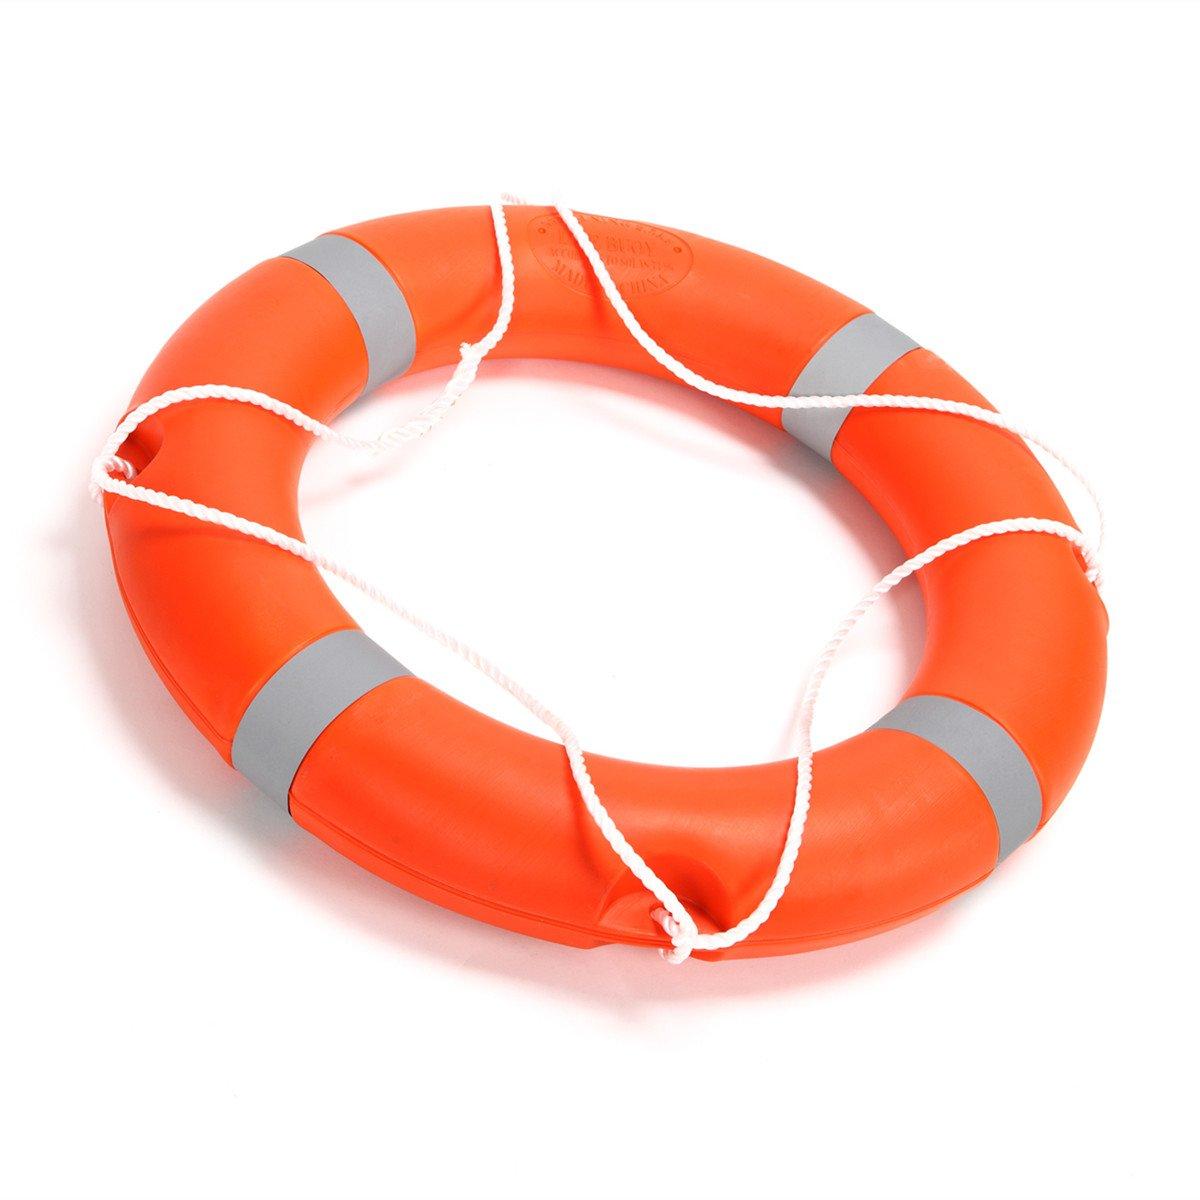 BeautySu. 28'' Diameter Professional Adult Foam Swim Ring Buoy Orange Lifering with White Bands by BeautySu. (Image #5)